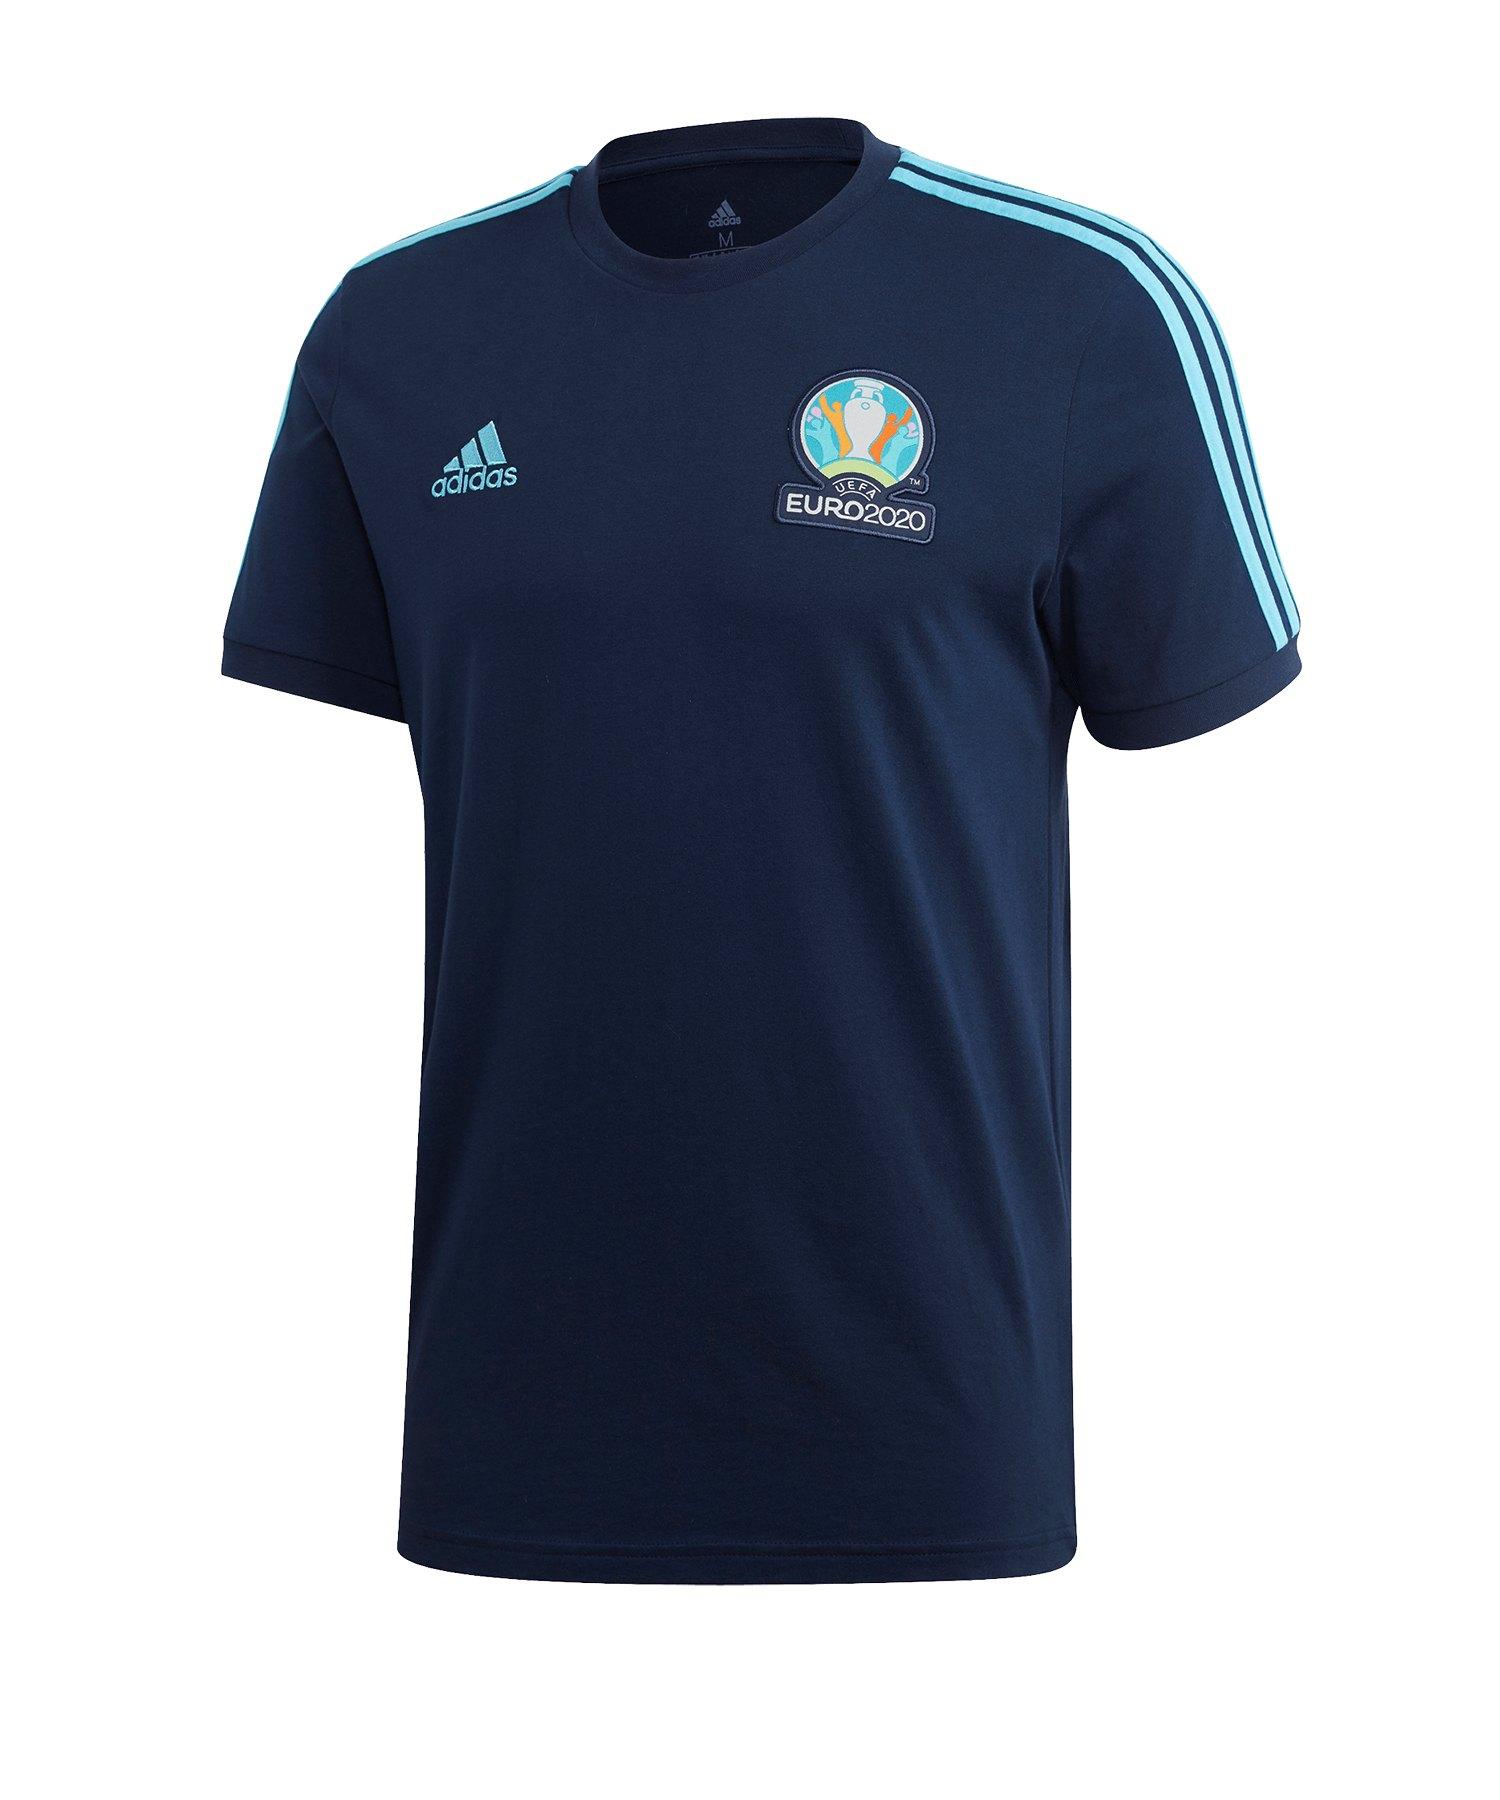 adidas UEFA EM 2020 T-Shirt Blau - blau